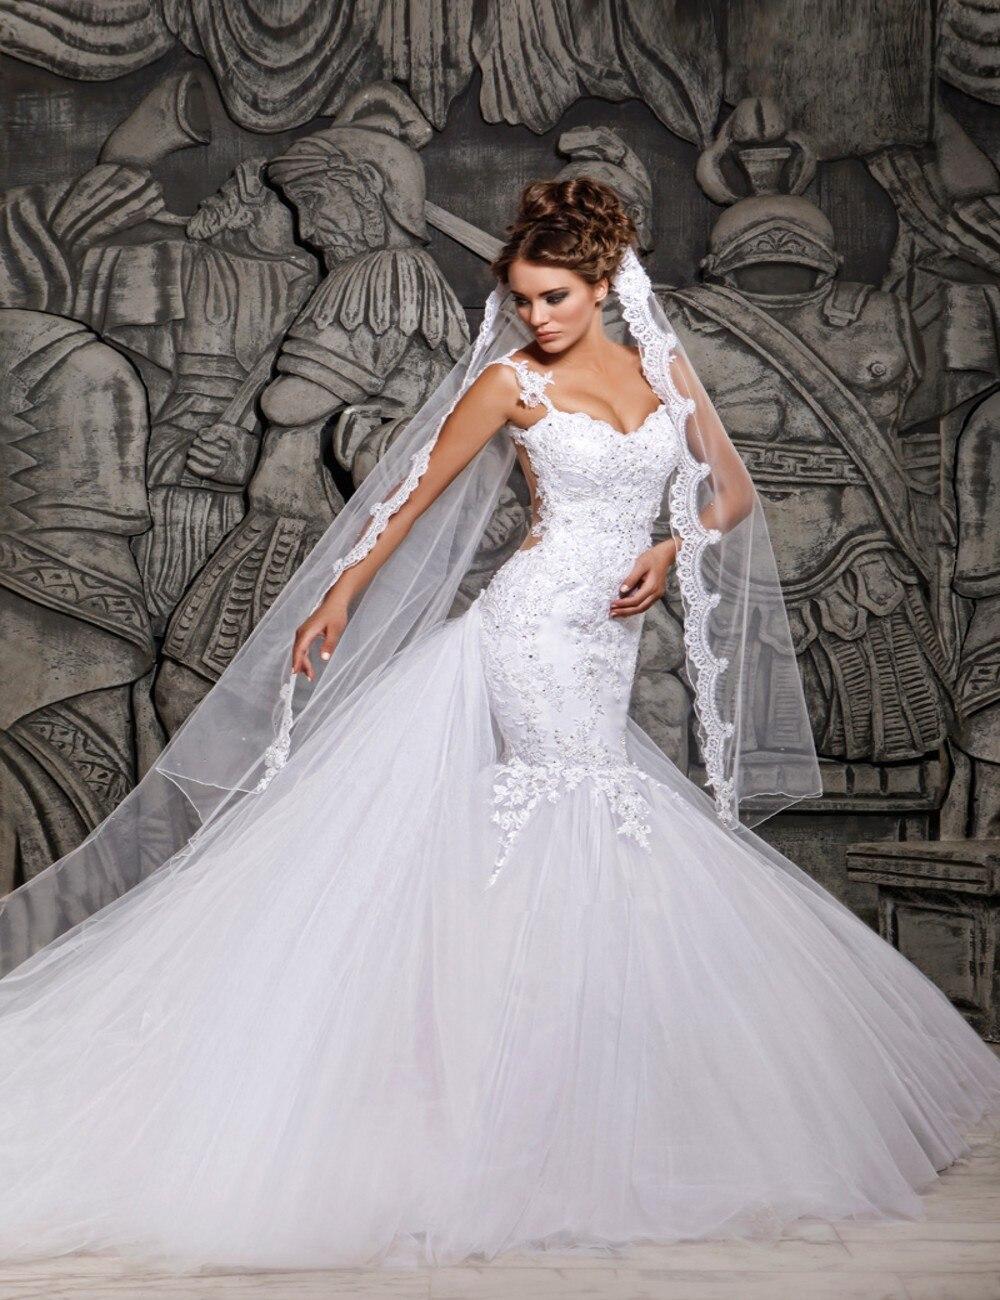 Vivian 39 s Bridal 2018 Spaghetti Straps Sweetheart Mermaid Wedding Dress Watteau Train Backless Lace Appliques Bridal Dress in Wedding Dresses from Weddings amp Events